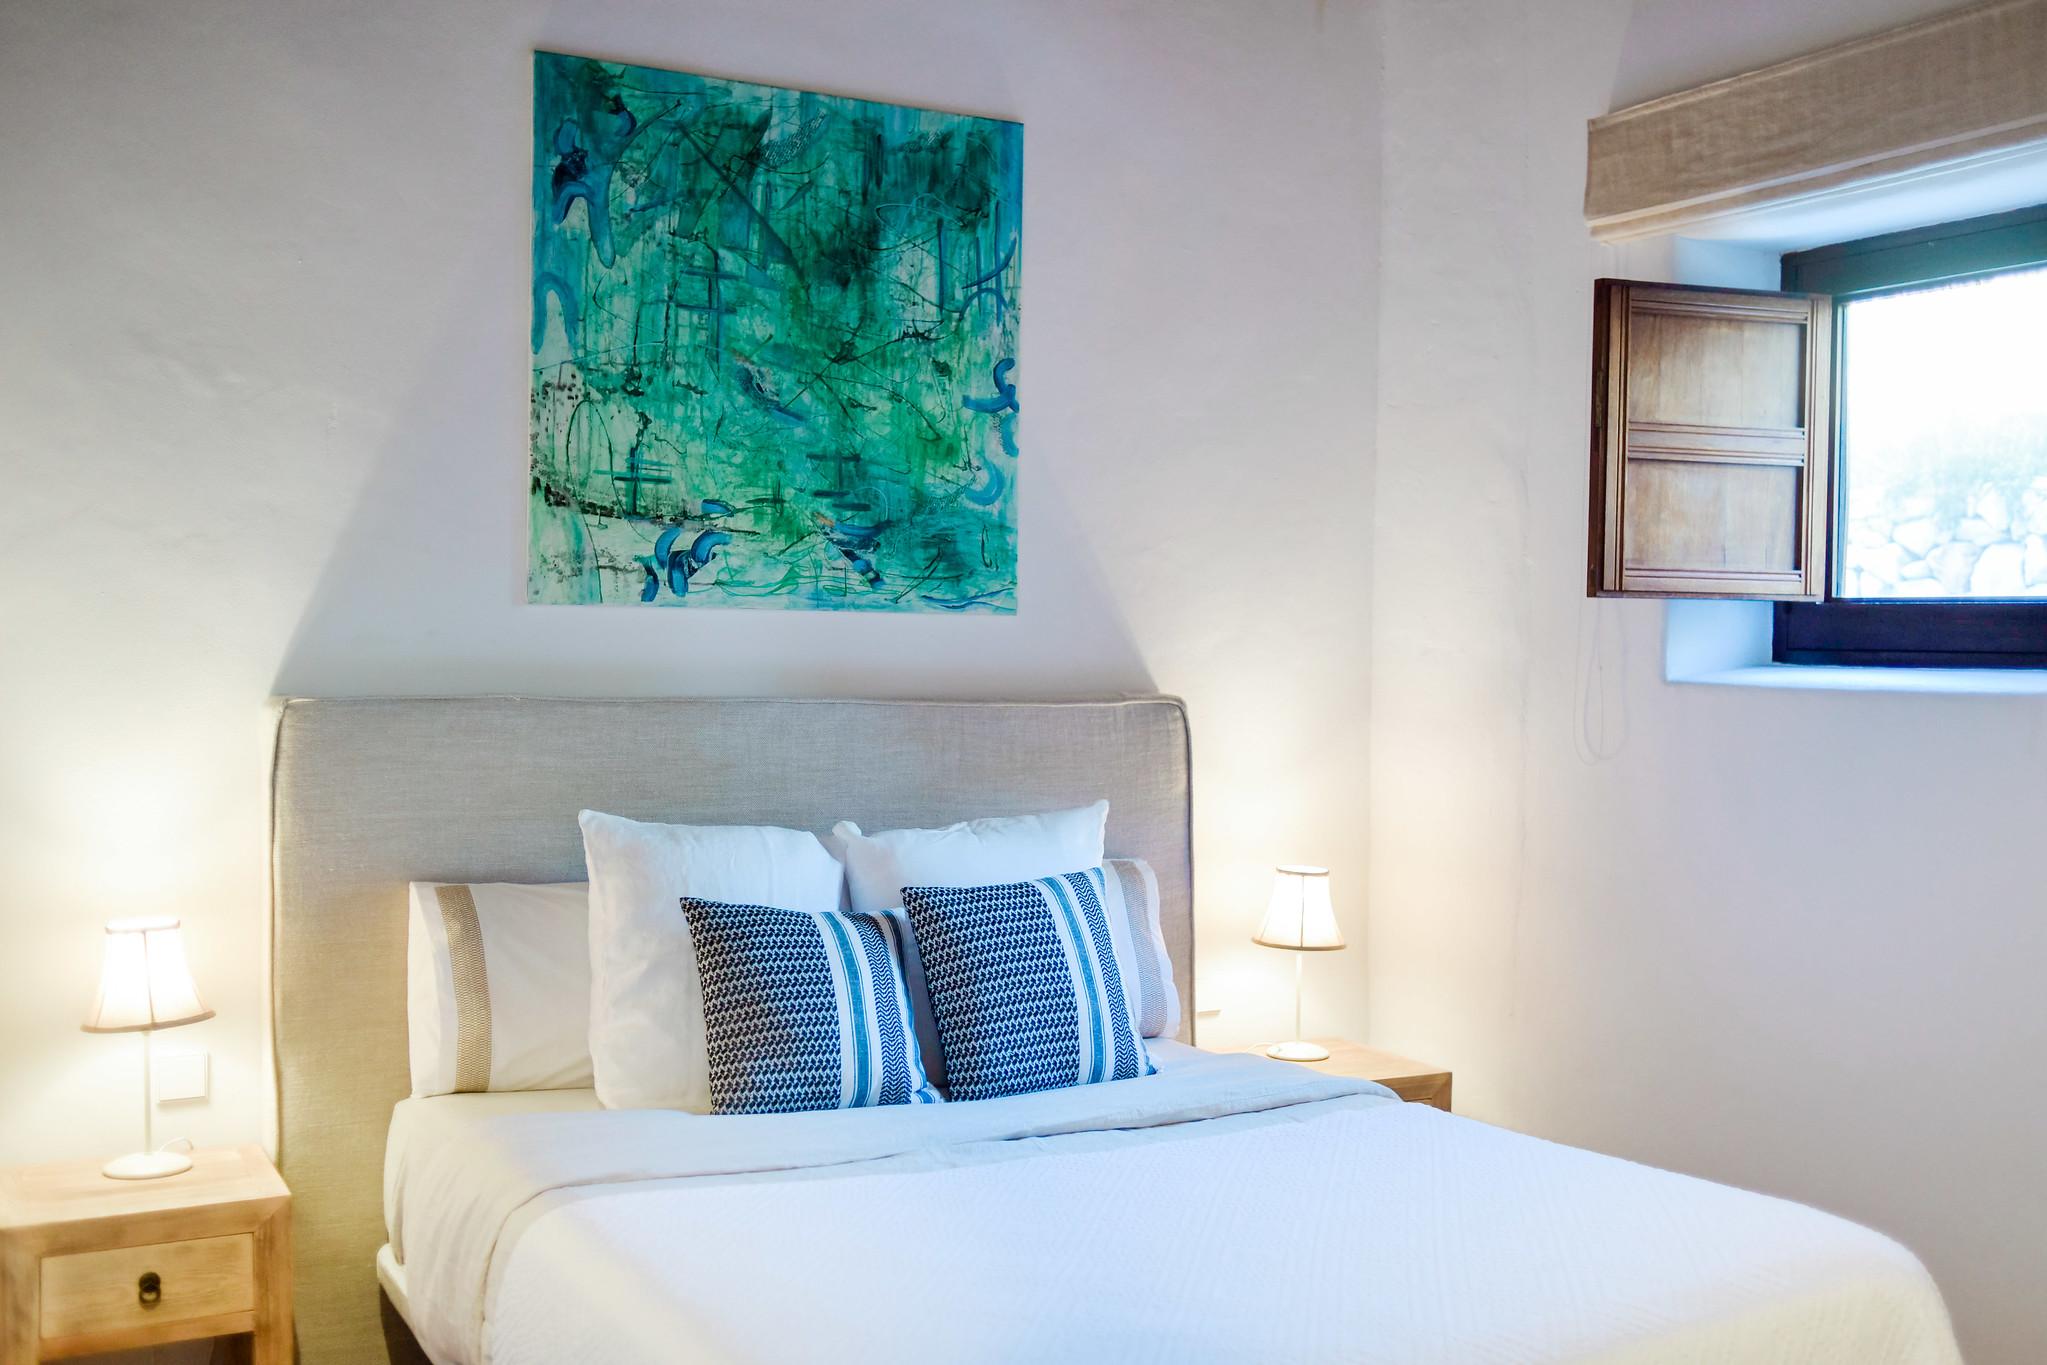 https://www.white-ibiza.com/wp-content/uploads/2020/05/white-ibiza-villas-can-lavanda-double-bedroom.jpg